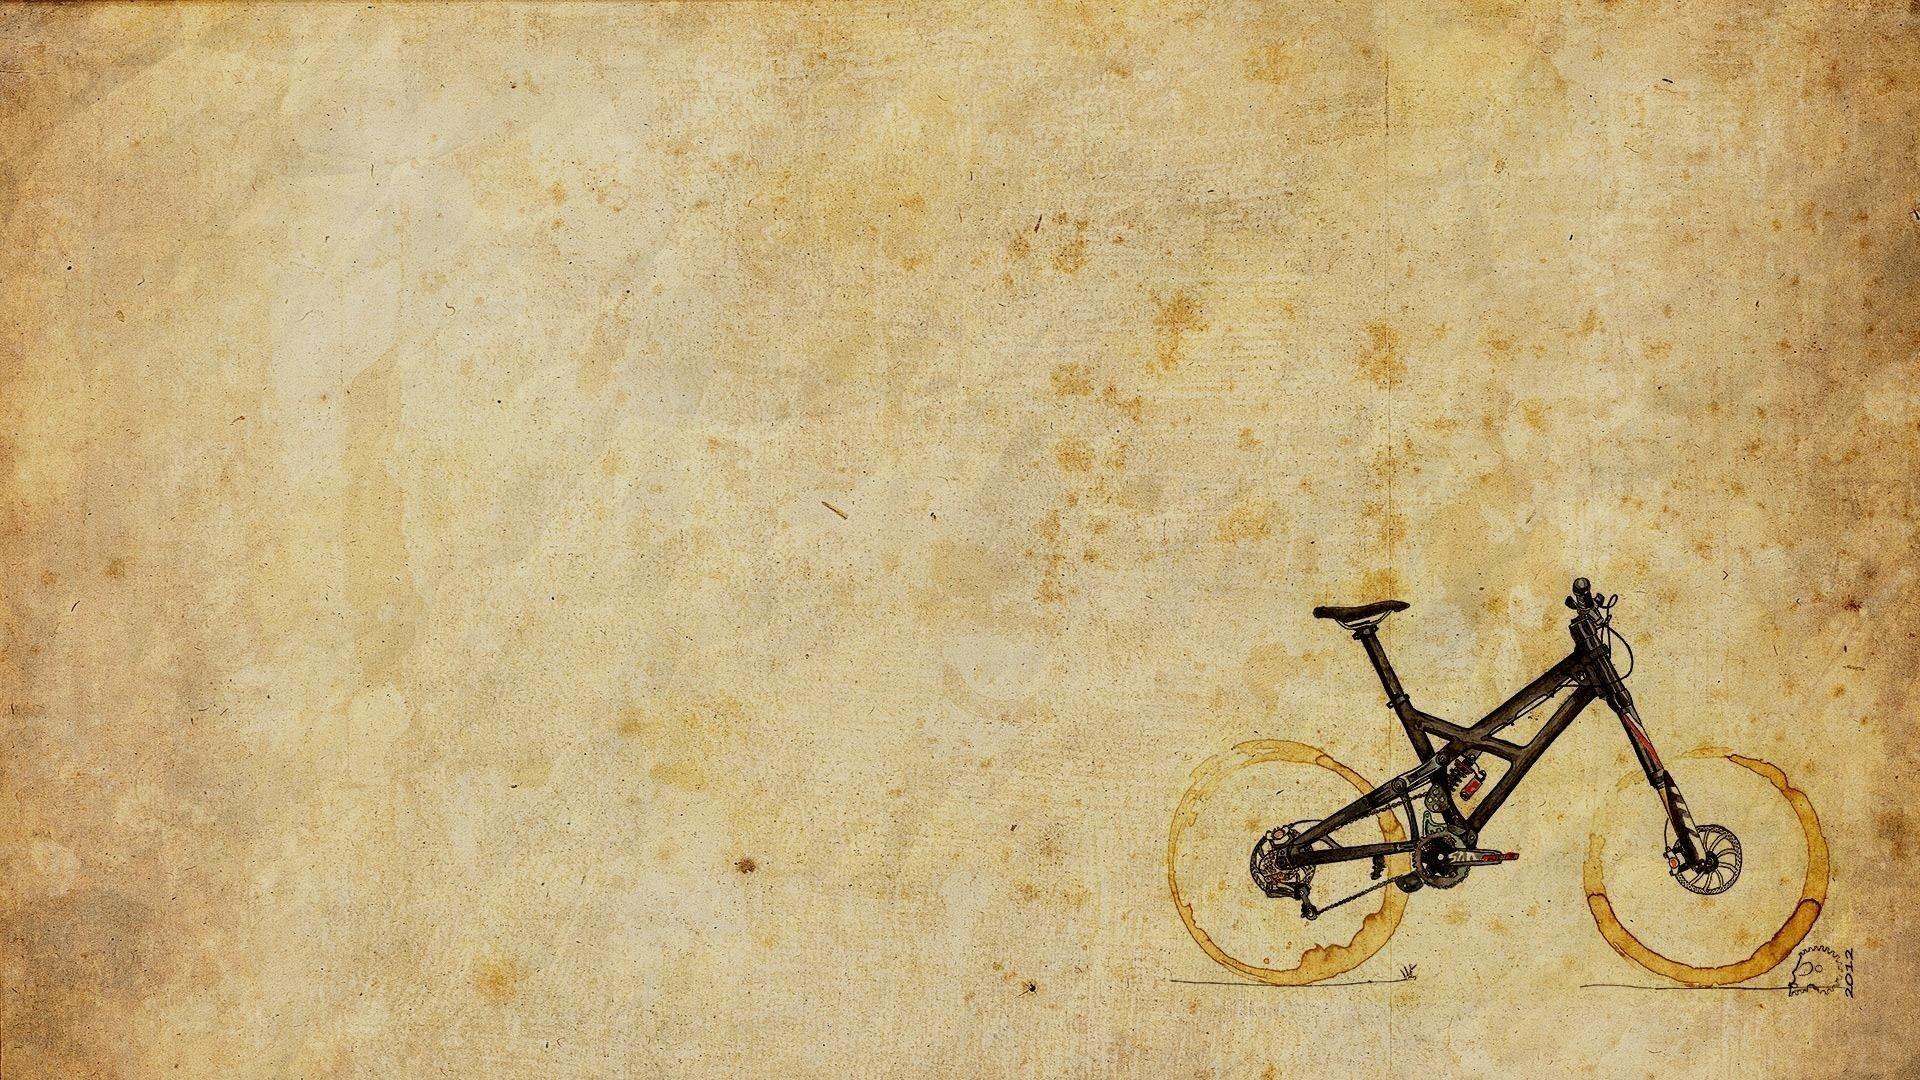 Res: 1920x1080, Mountain Bike ❤ 4K HD Desktop Wallpaper for 4K Ultra HD TV • Dual